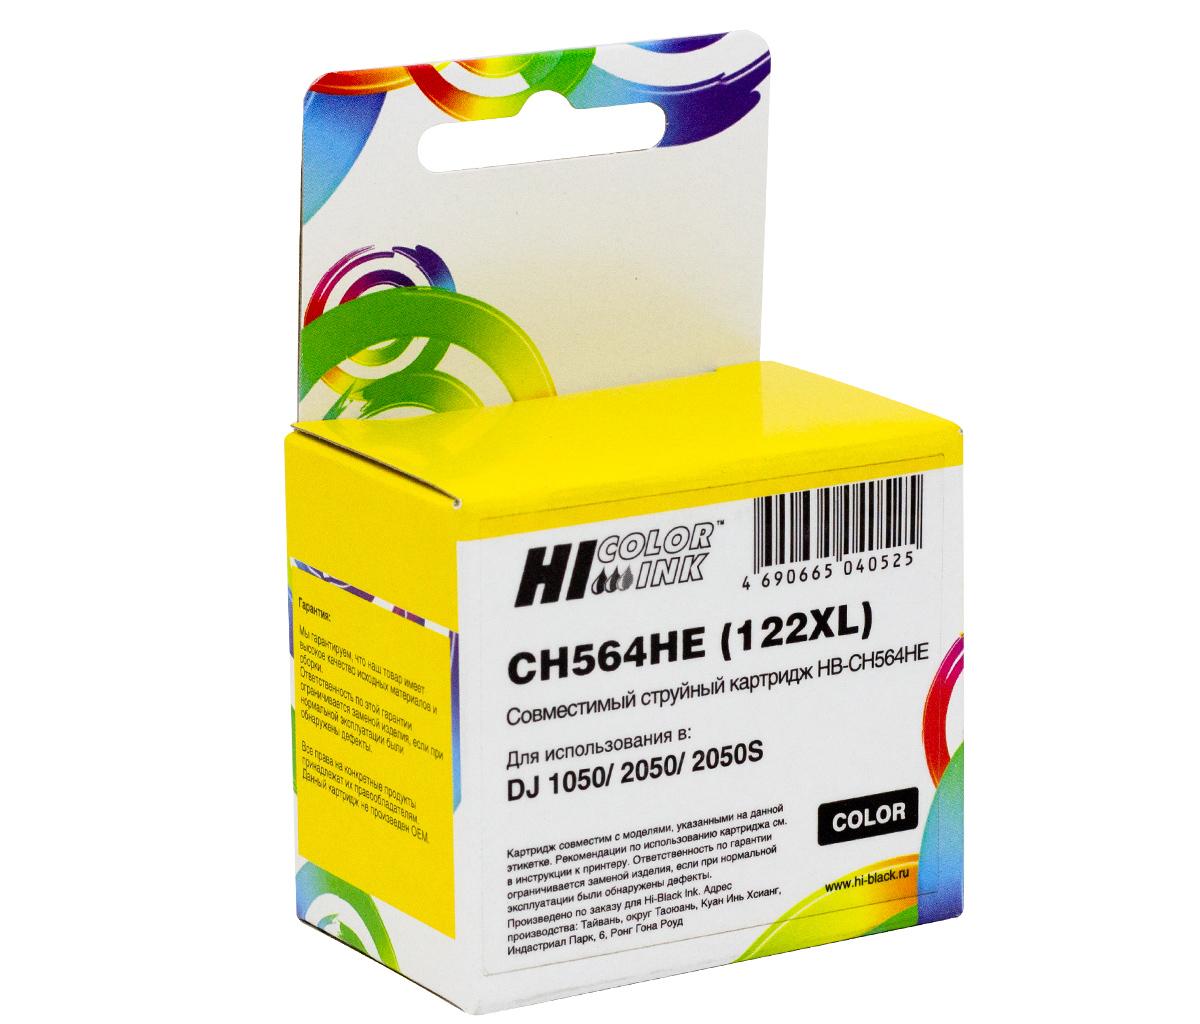 Картридж Hi-Black (CH564HE) для HP DJ 1050/2050/2050S, №122XL, Color